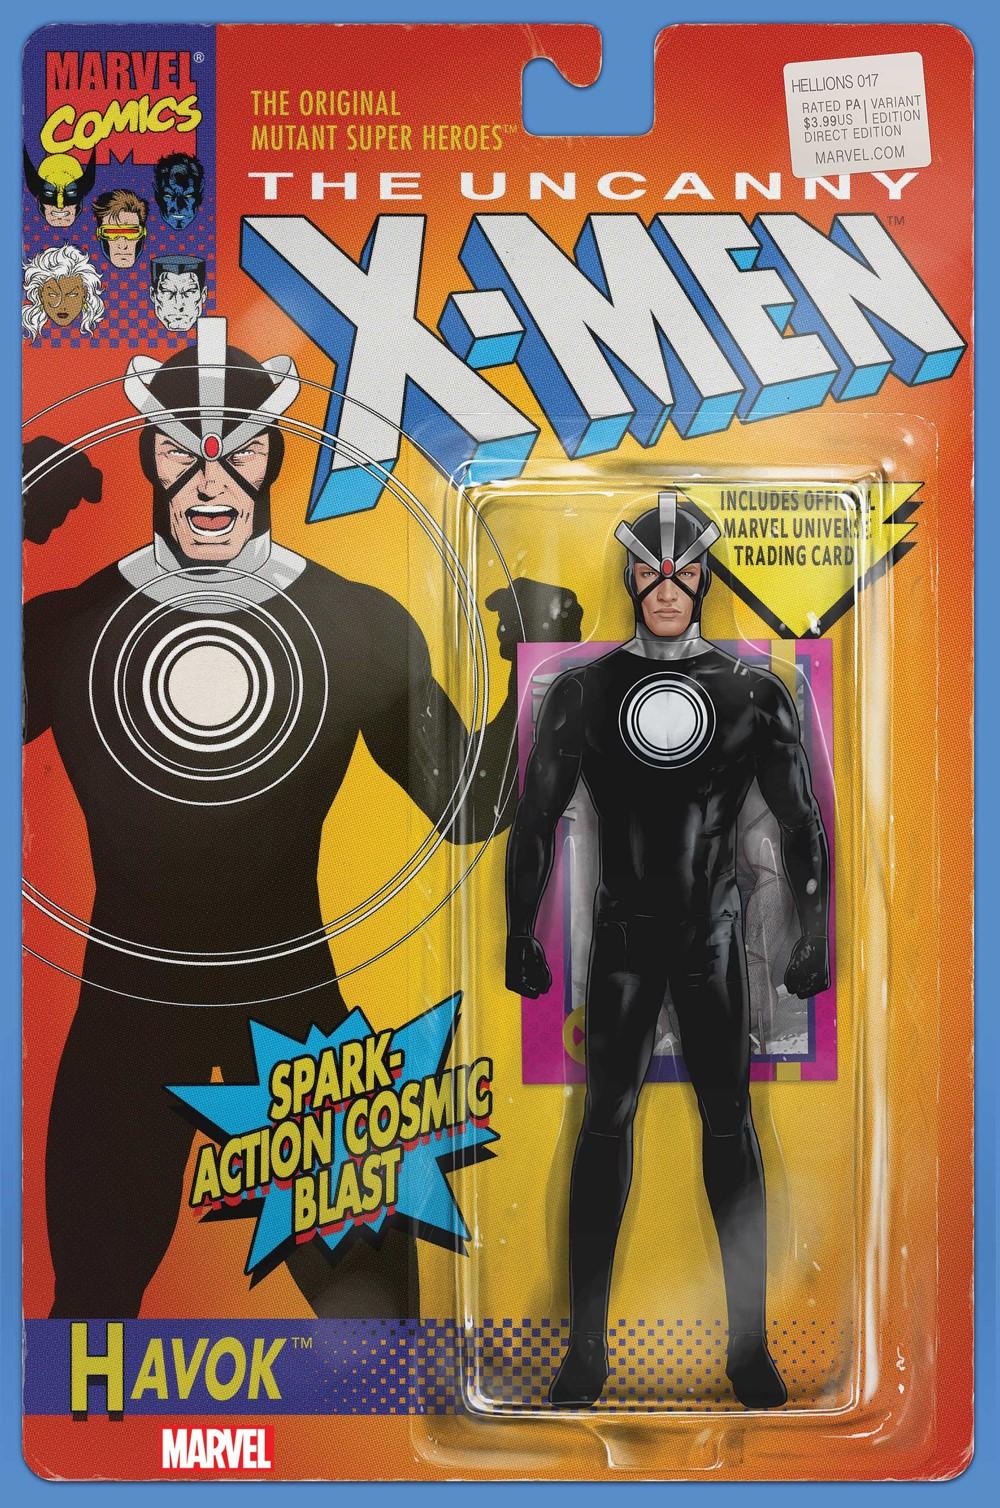 HELLIONS2020017_JTC-action-figure Marvel Comics November 2021 Solicitations